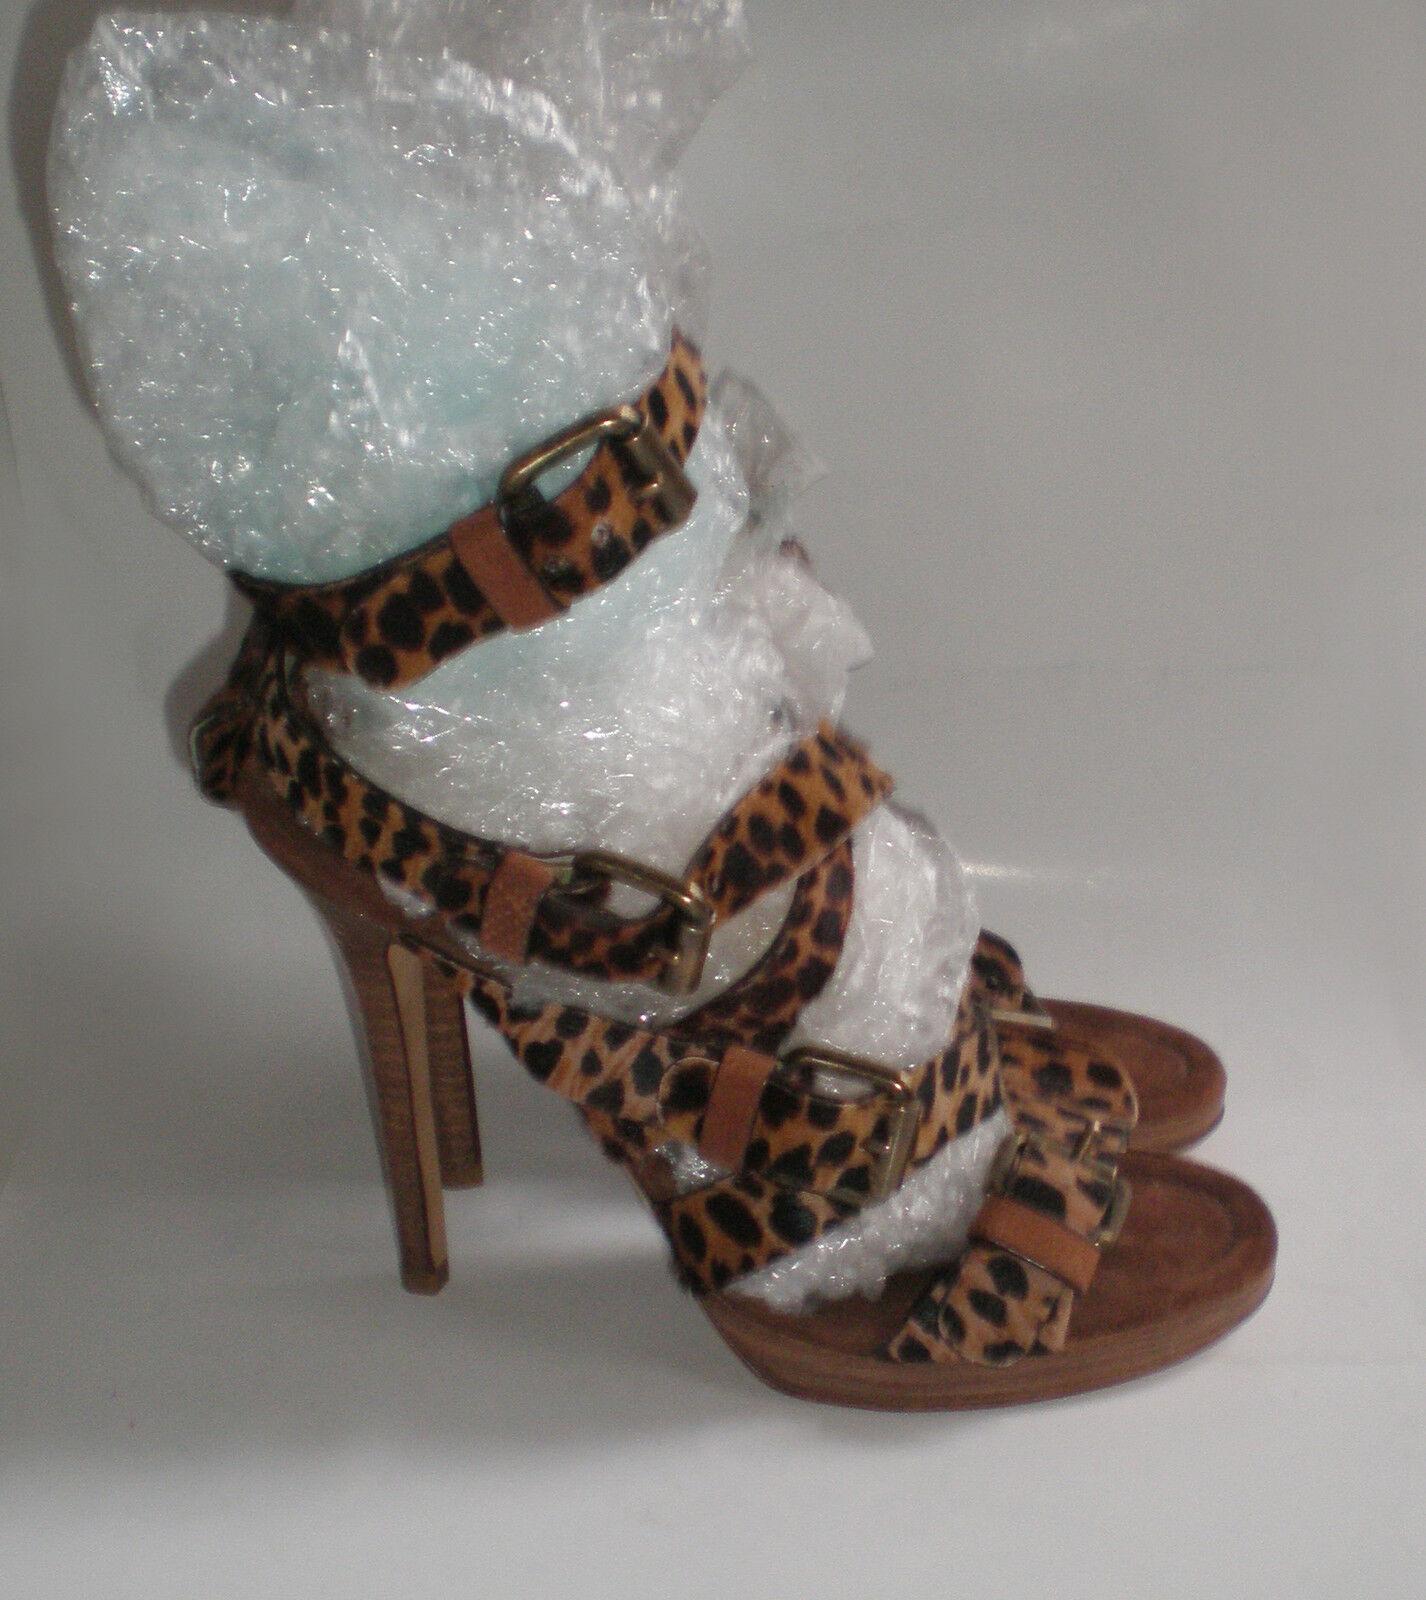 Dolce & Gabbana D&G Schuhe, Größe: Pony und Büffel Leder, Größe: Schuhe, 39, NP 390,-€ b46e33